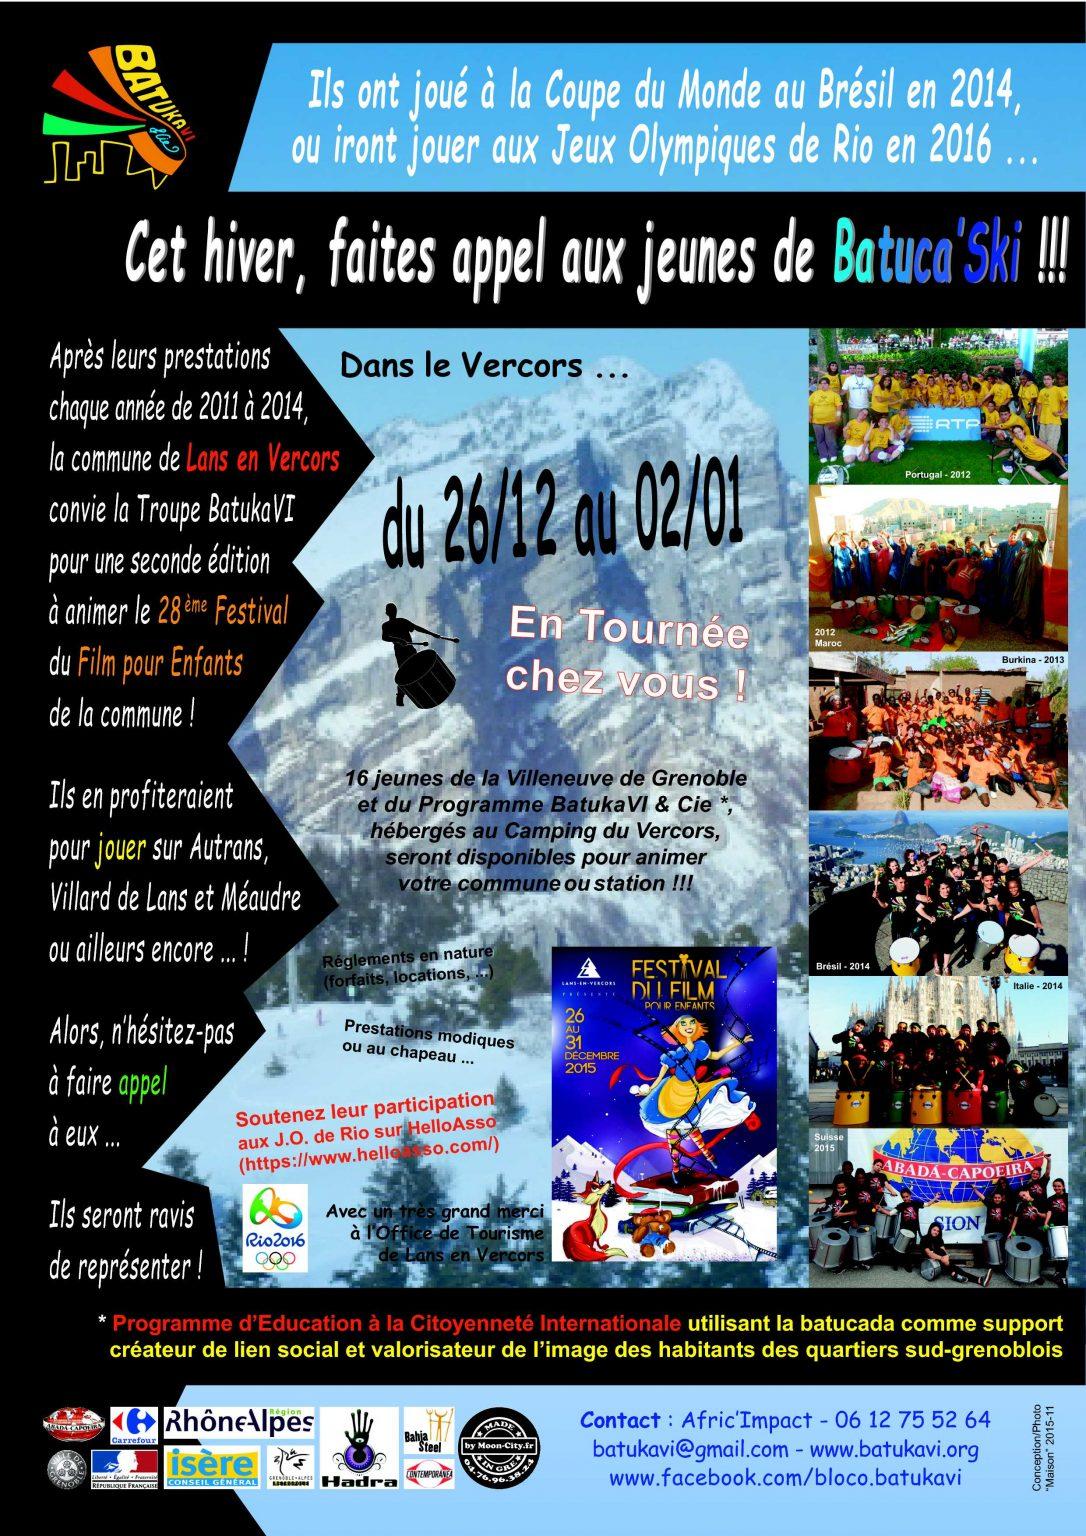 2015-12 Camp-Tournée Batuca'Ski - Vercors (Appel)